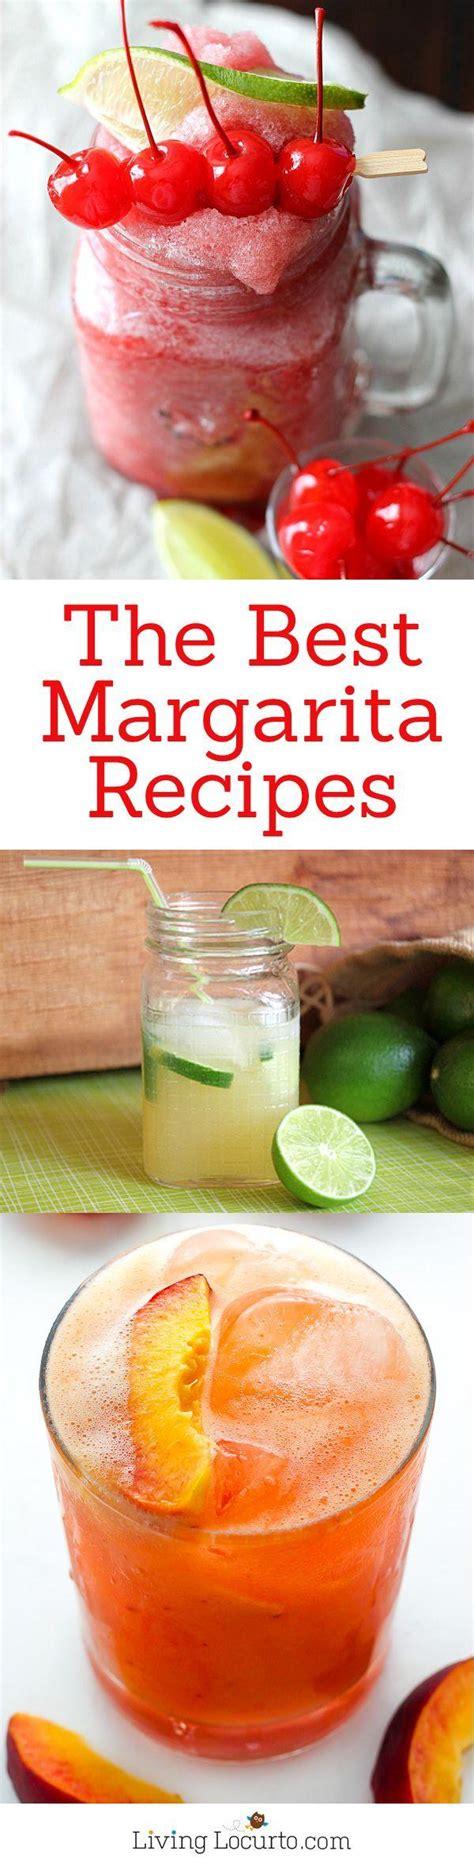 the best margaritas cocktails drinks the best margarita recipes 2499301